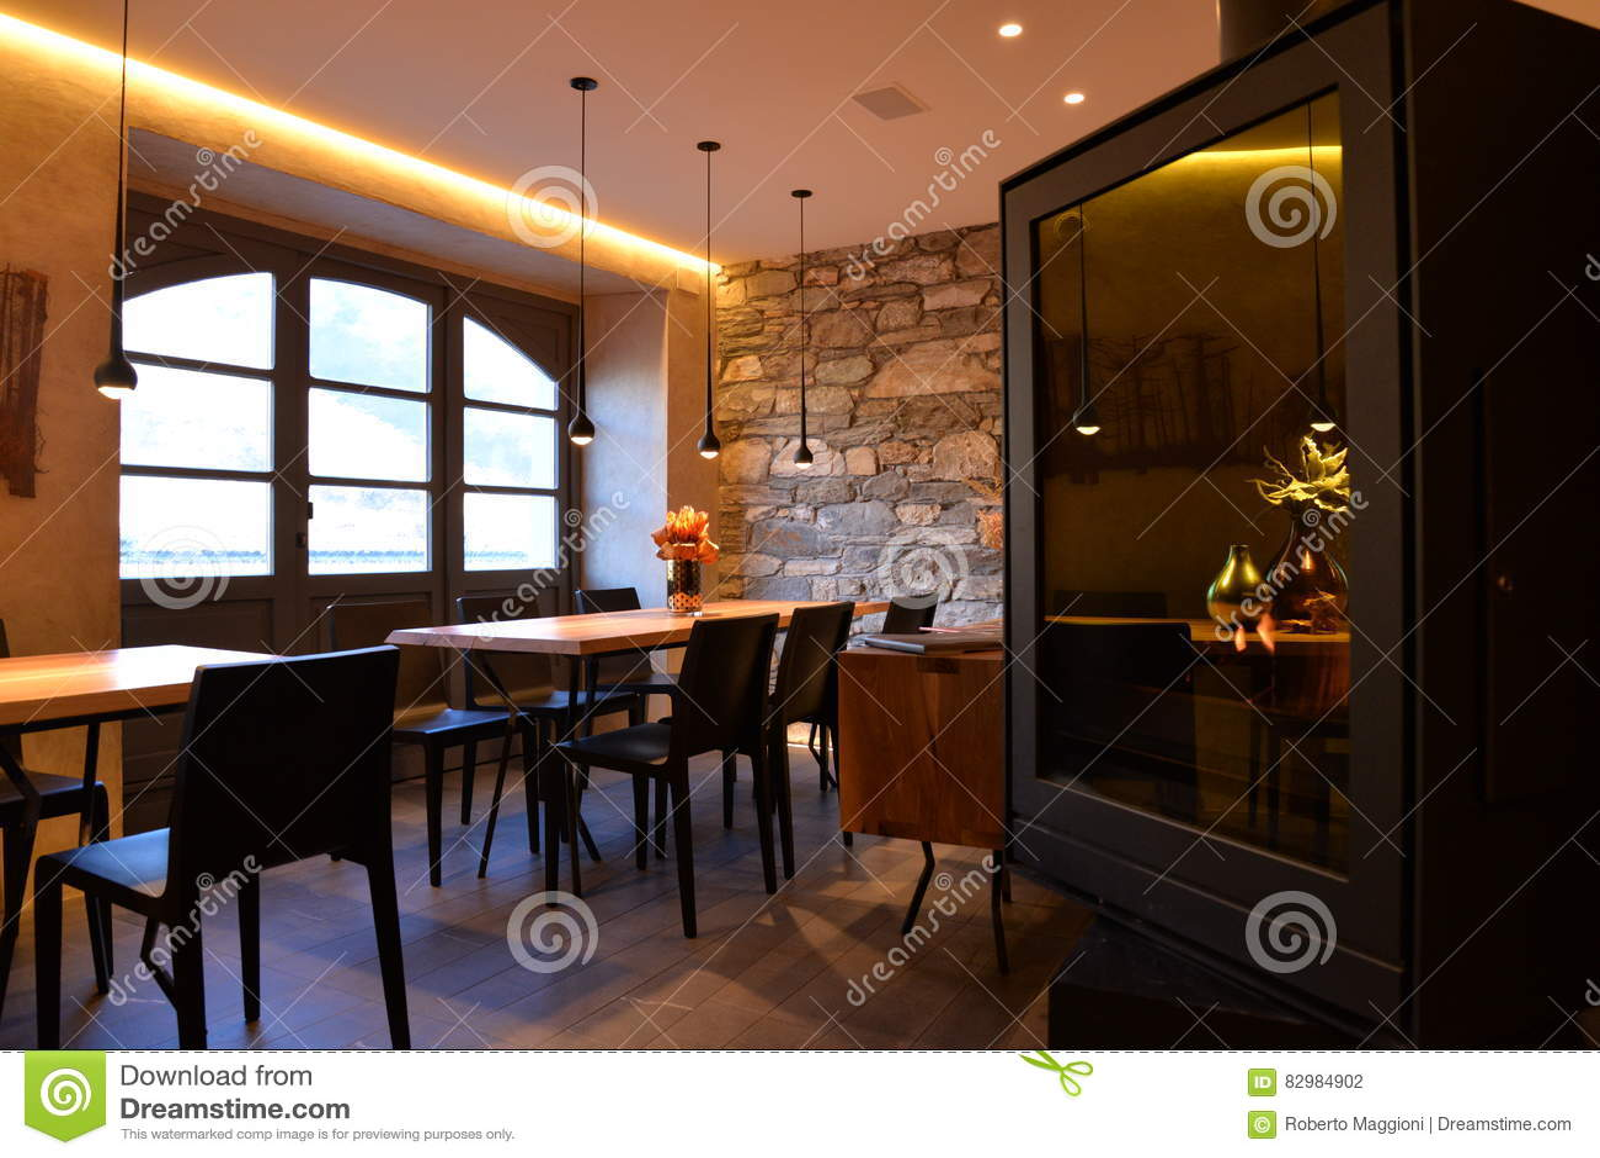 modern restaurant interior design stylish dining room stock photo image 82984902. Black Bedroom Furniture Sets. Home Design Ideas